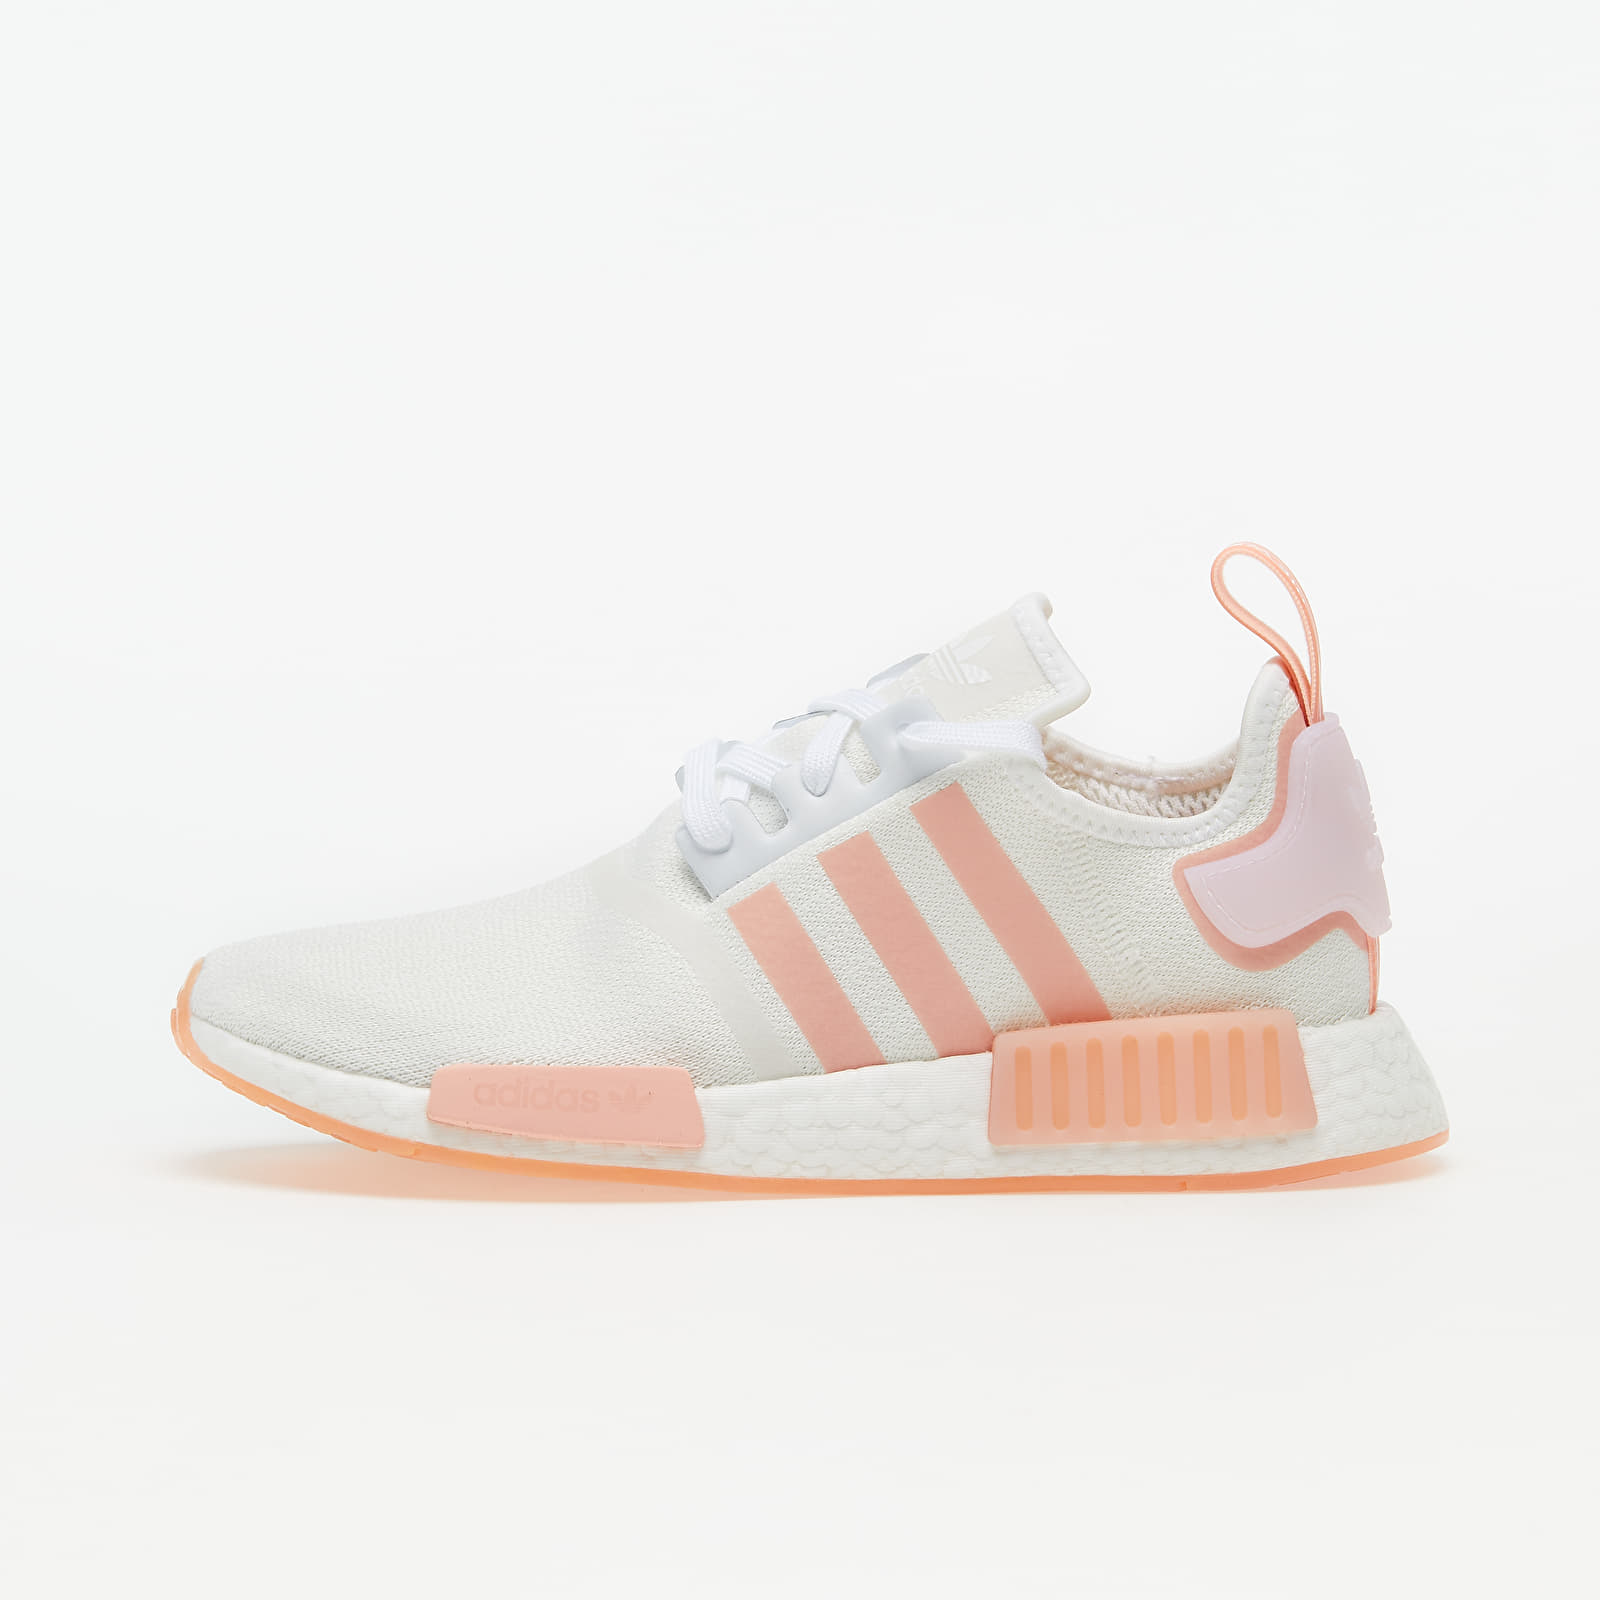 adidas NMD_R1 W Ftwr White/ Ftwr White/ Haze Coral EUR 39 1/3